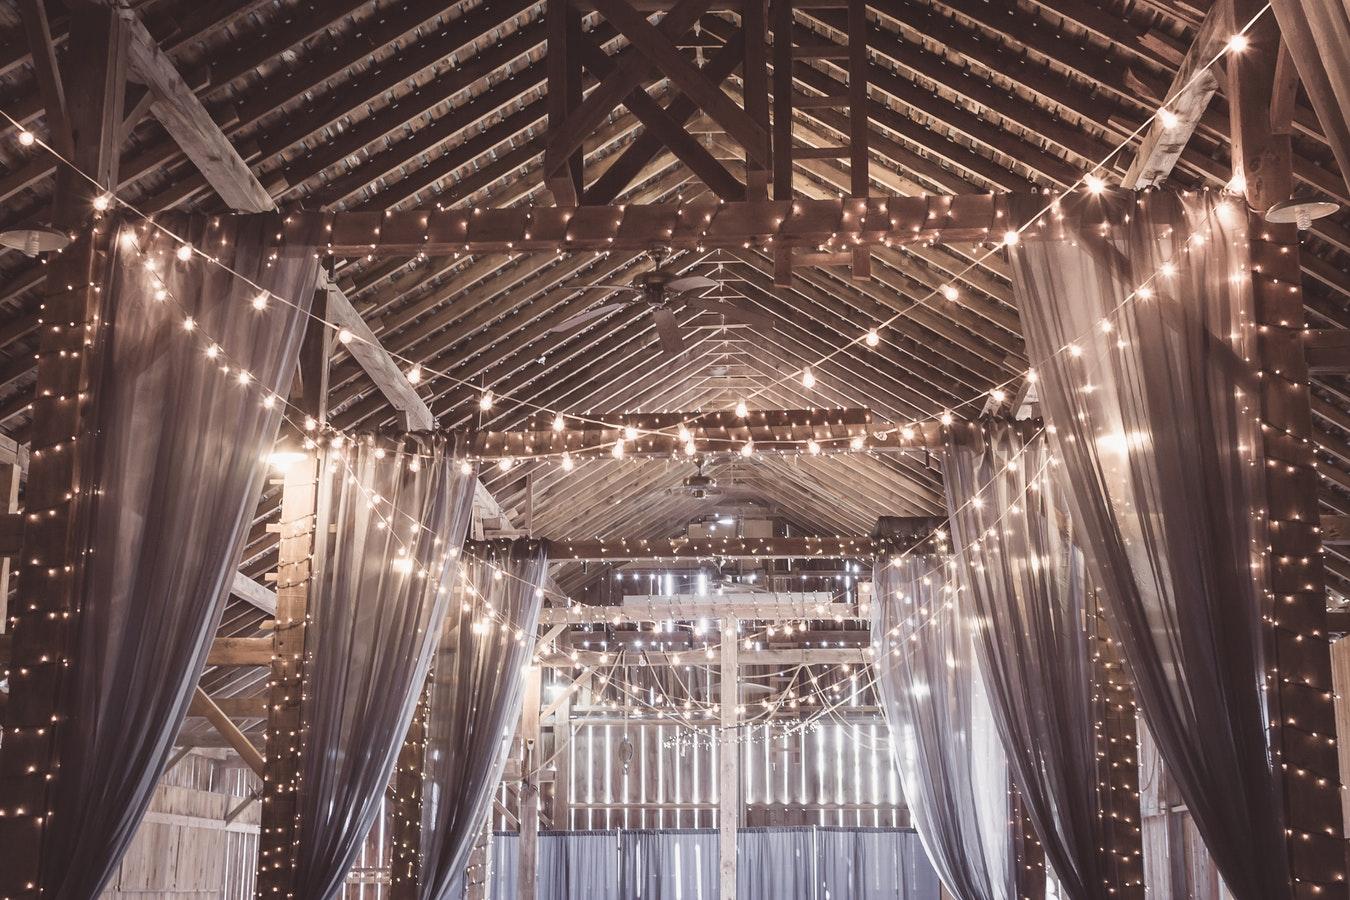 wedding barn lights.